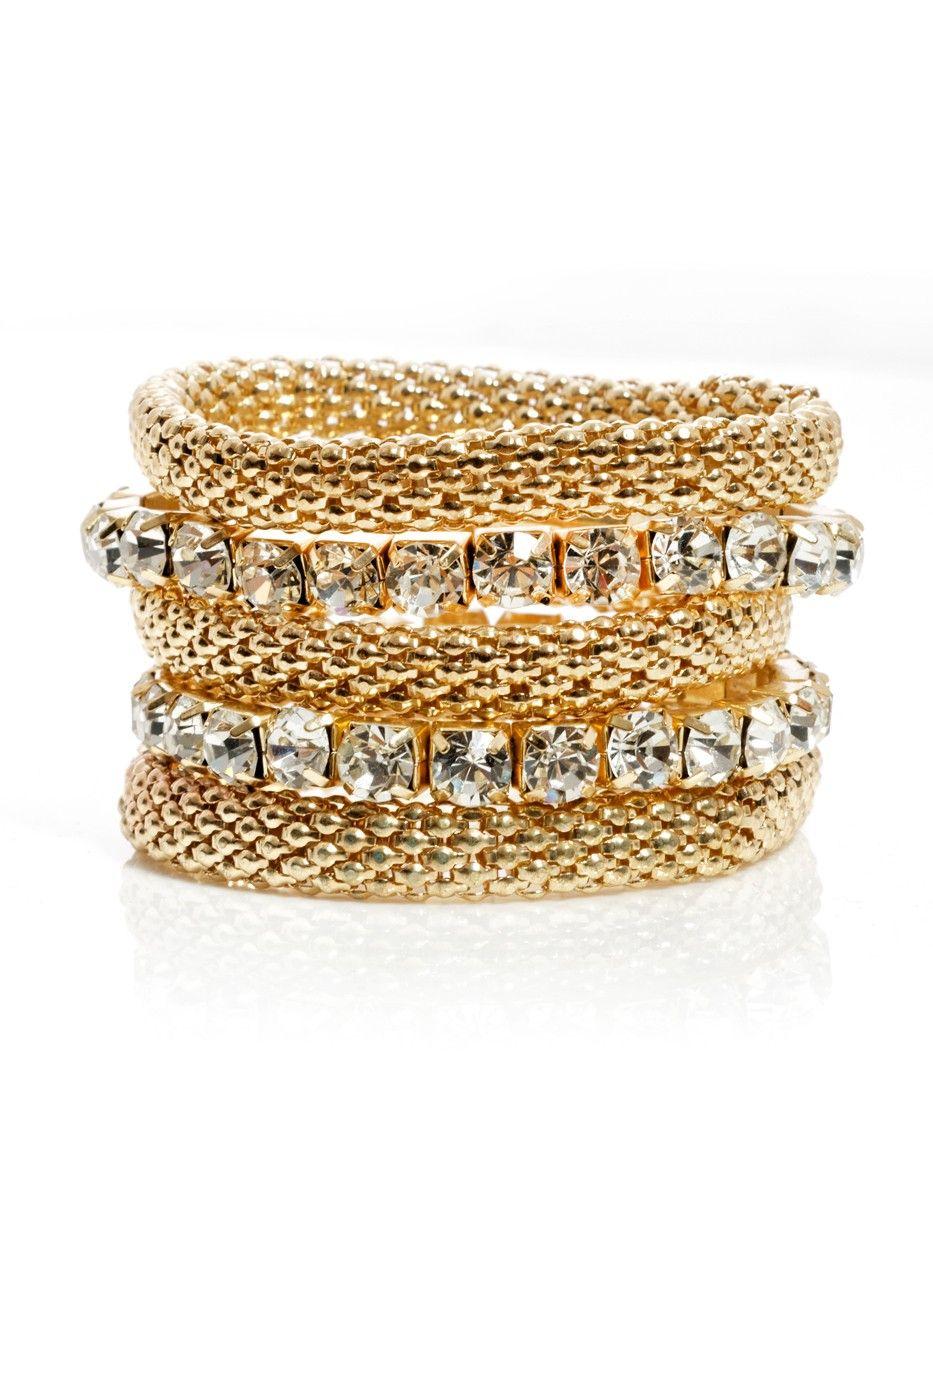 Charmer To Meet You Snake Chain Bracelet Set from Fashion to Figure (http://www.fashiontofigure.com/catalog/plus-size-accessories/plus-size-jewelry/bracelets/charmer-to-meet-you-snake-chain-bracelet-set.html)